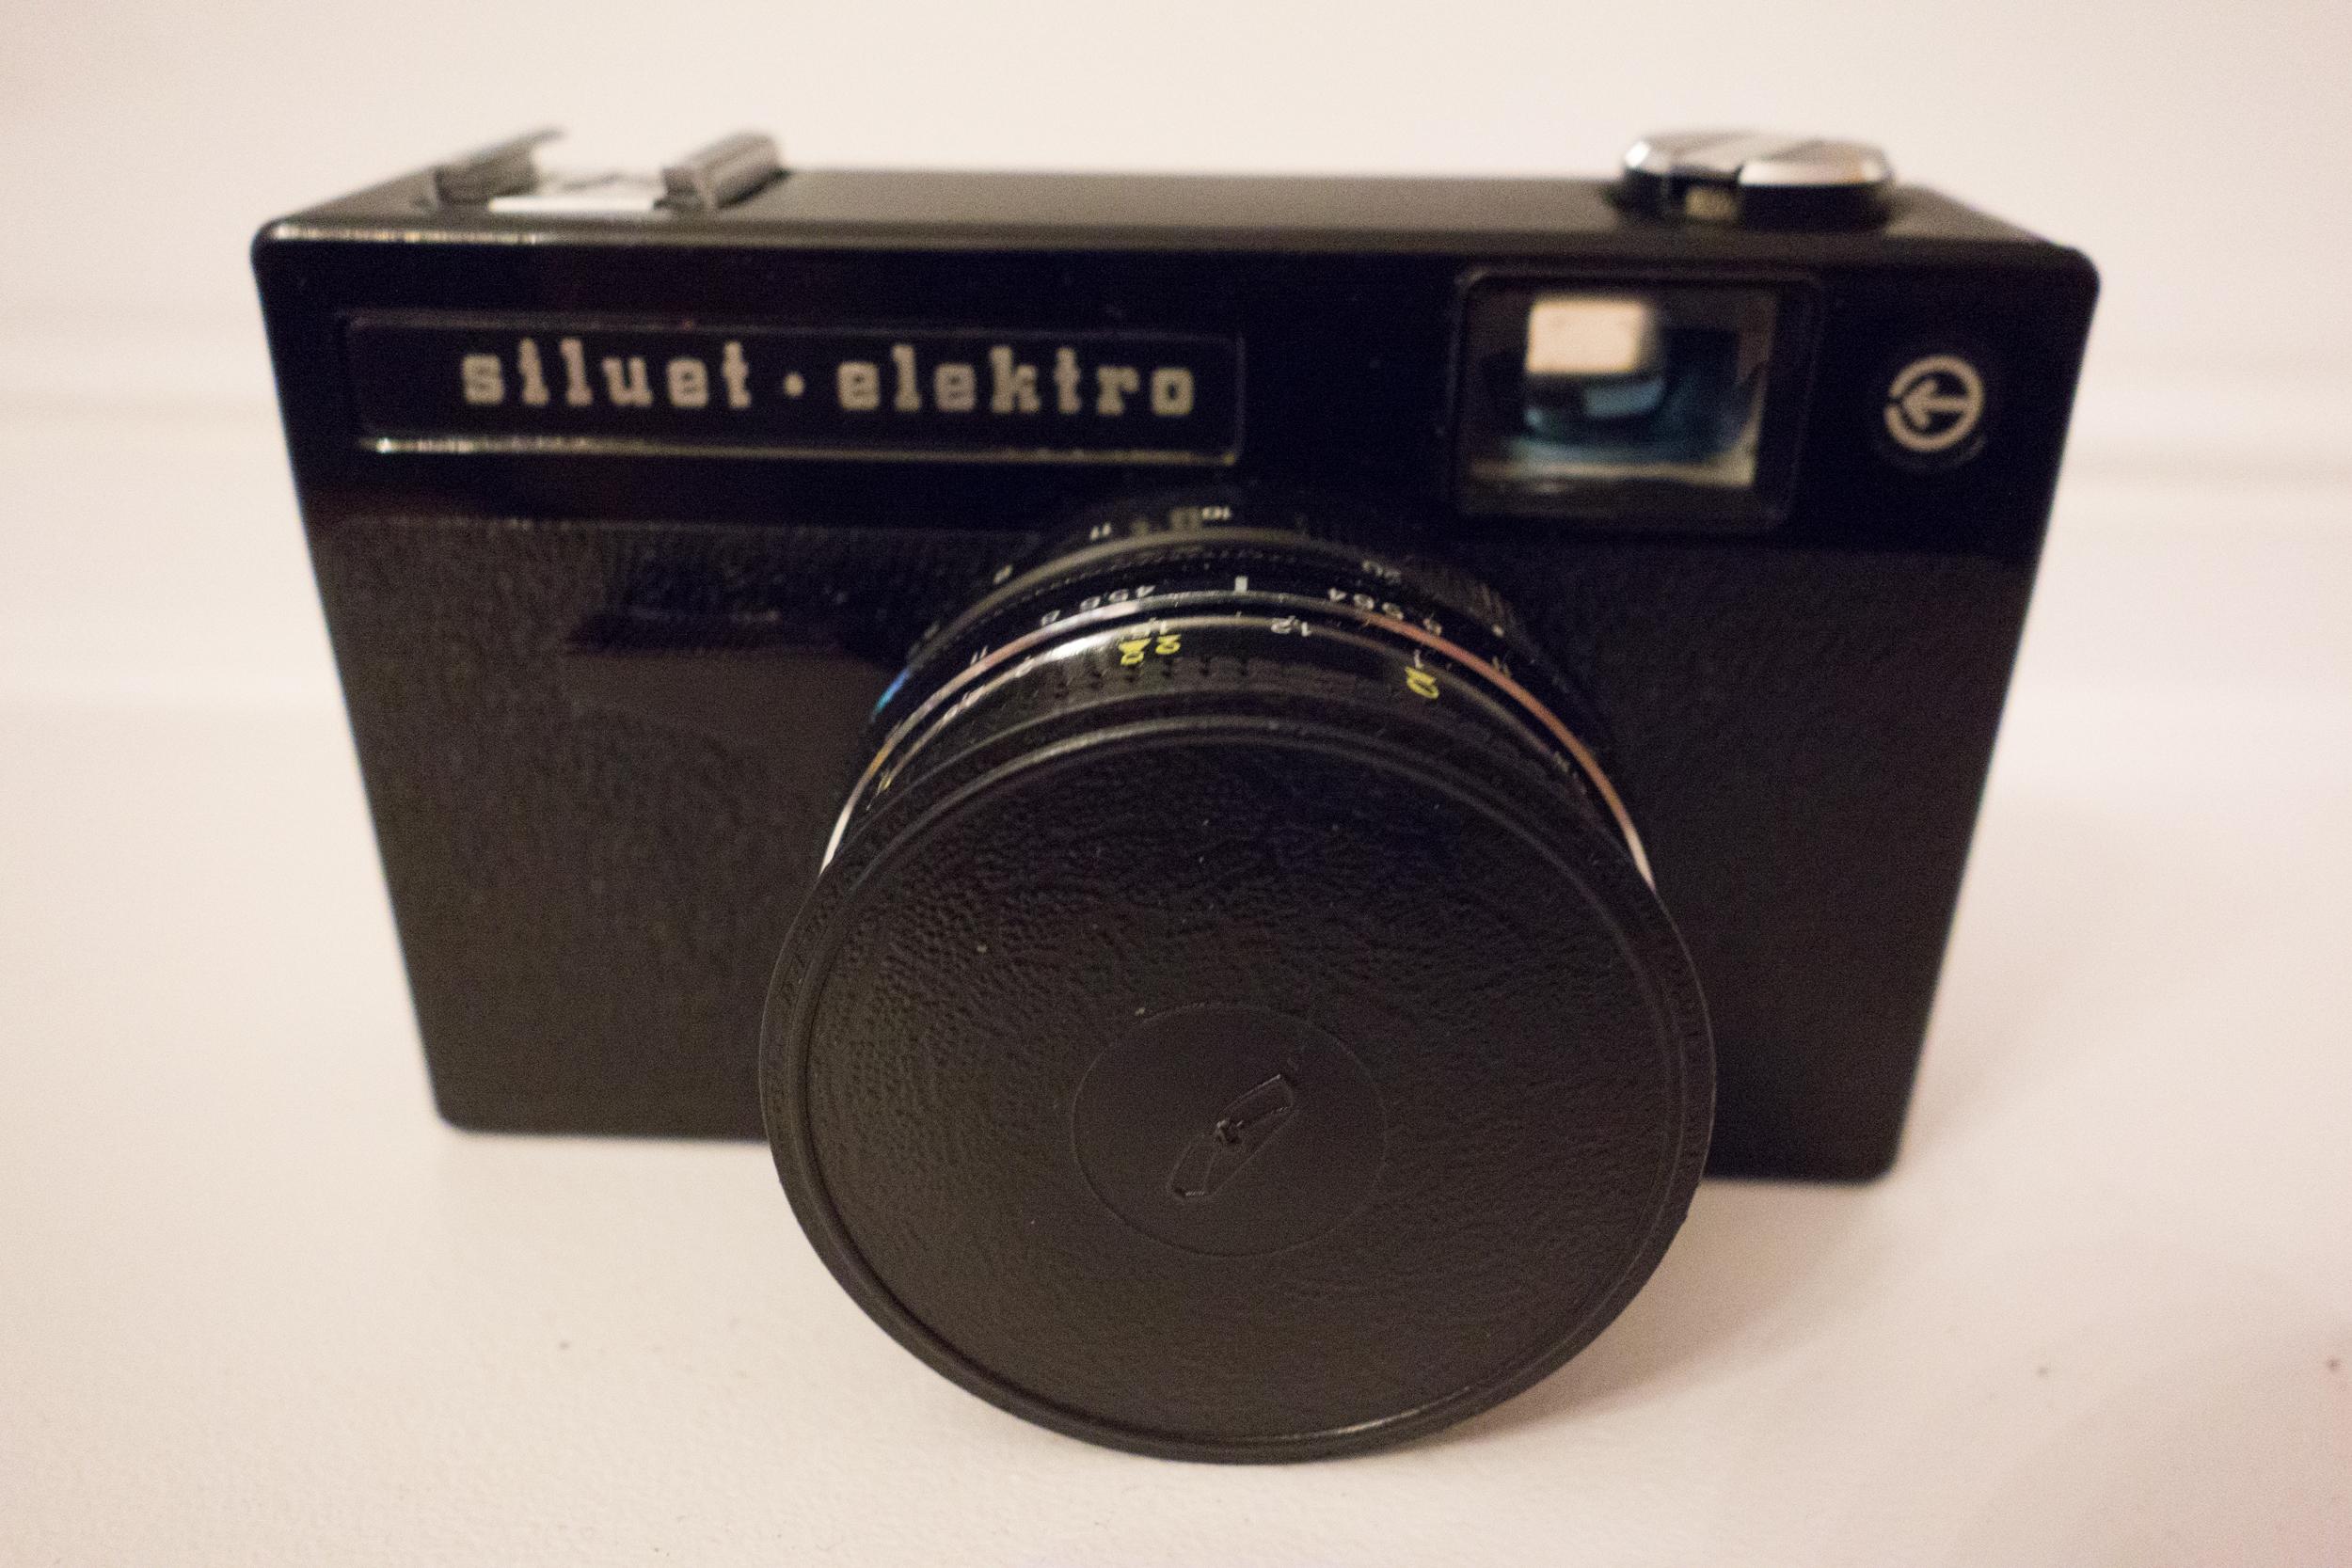 BelOMO Siluet-Elektro (Pic: Stephen Dowling)